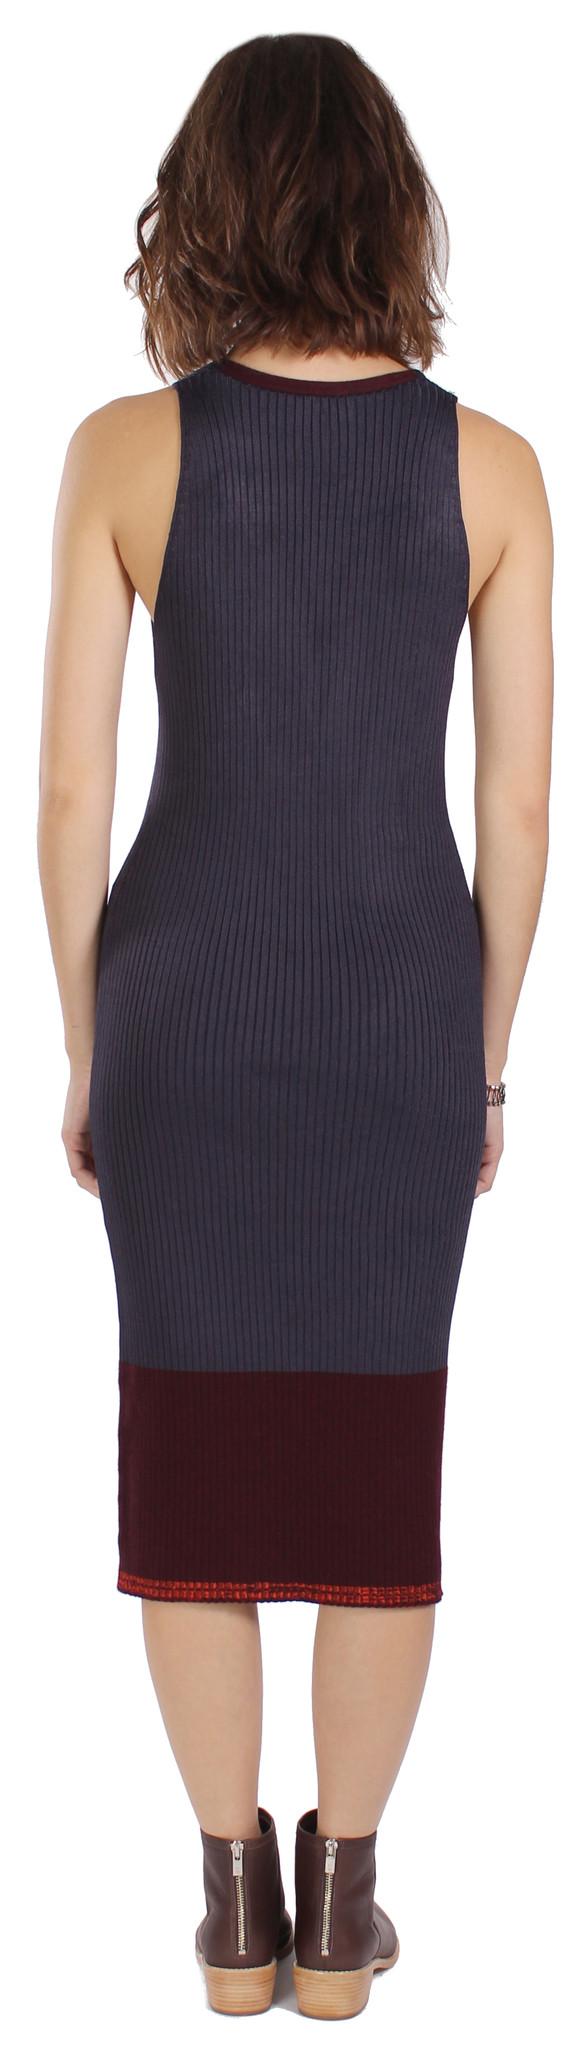 Rag & Bone Kristin Dress